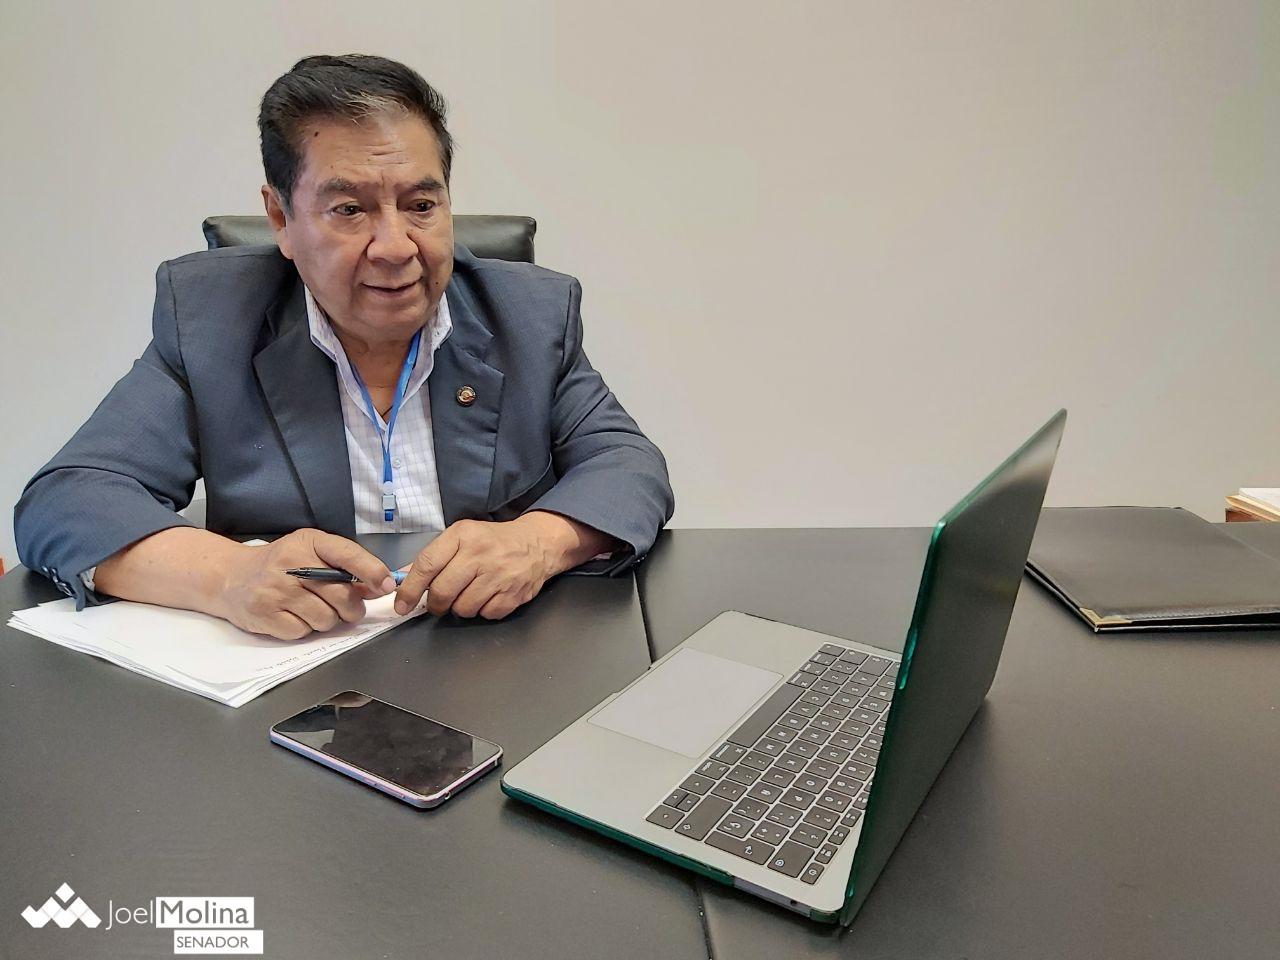 joel medina tlaxcala senador